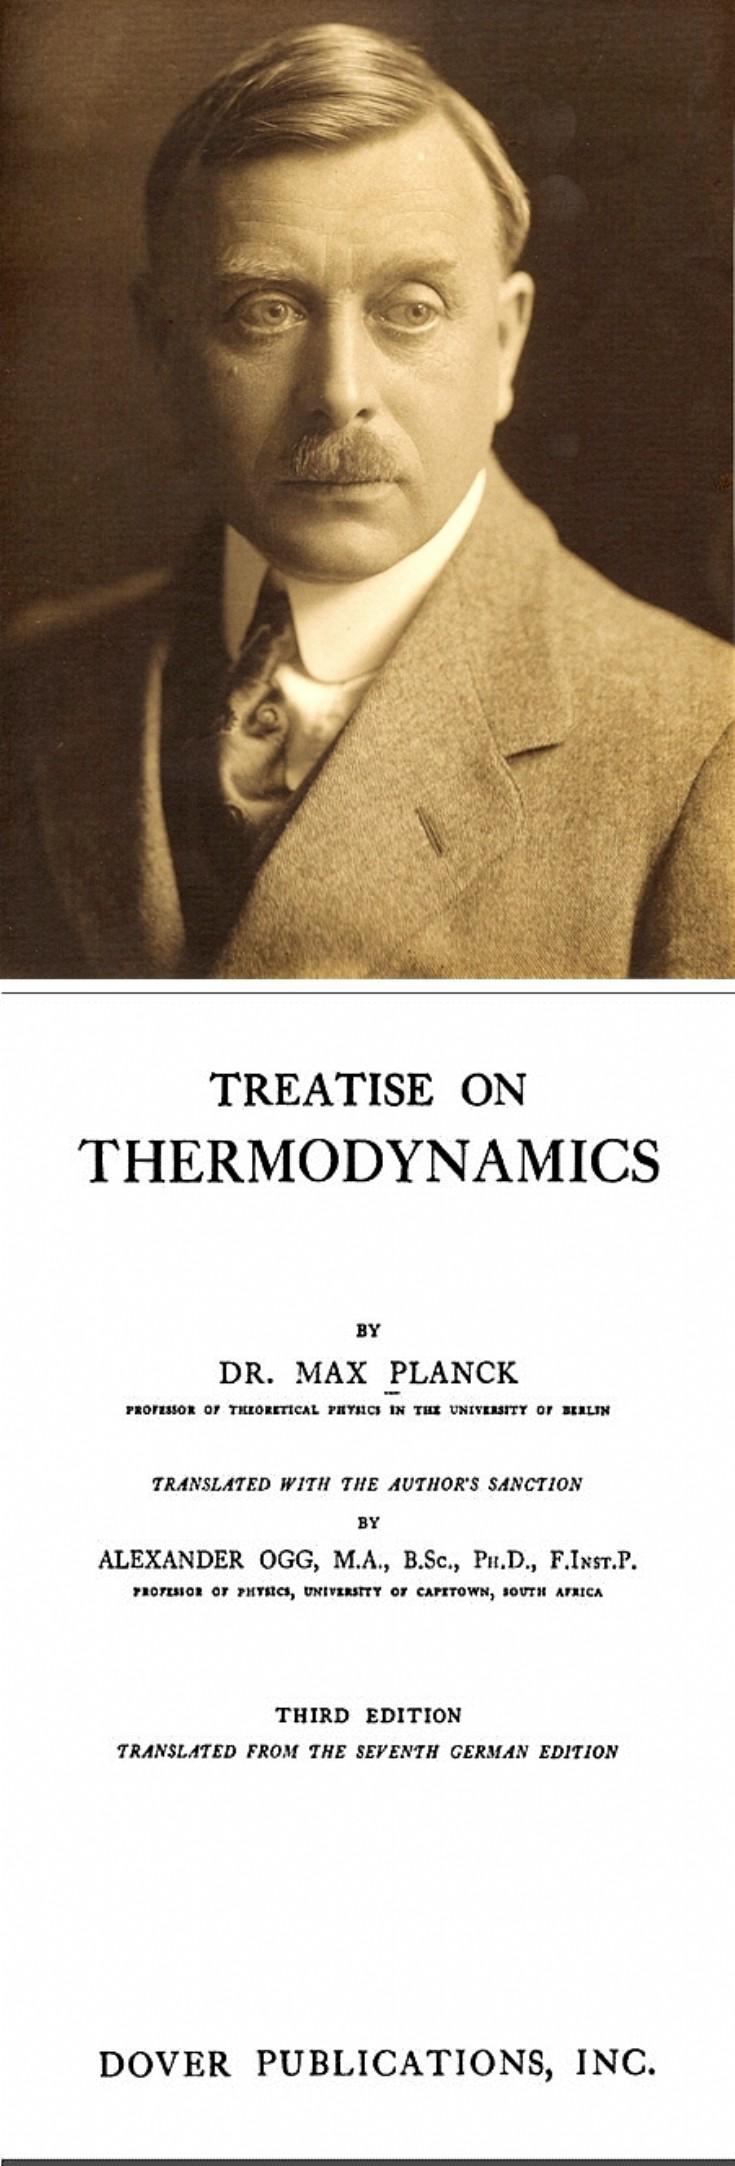 130  Professor Alexander Ogg